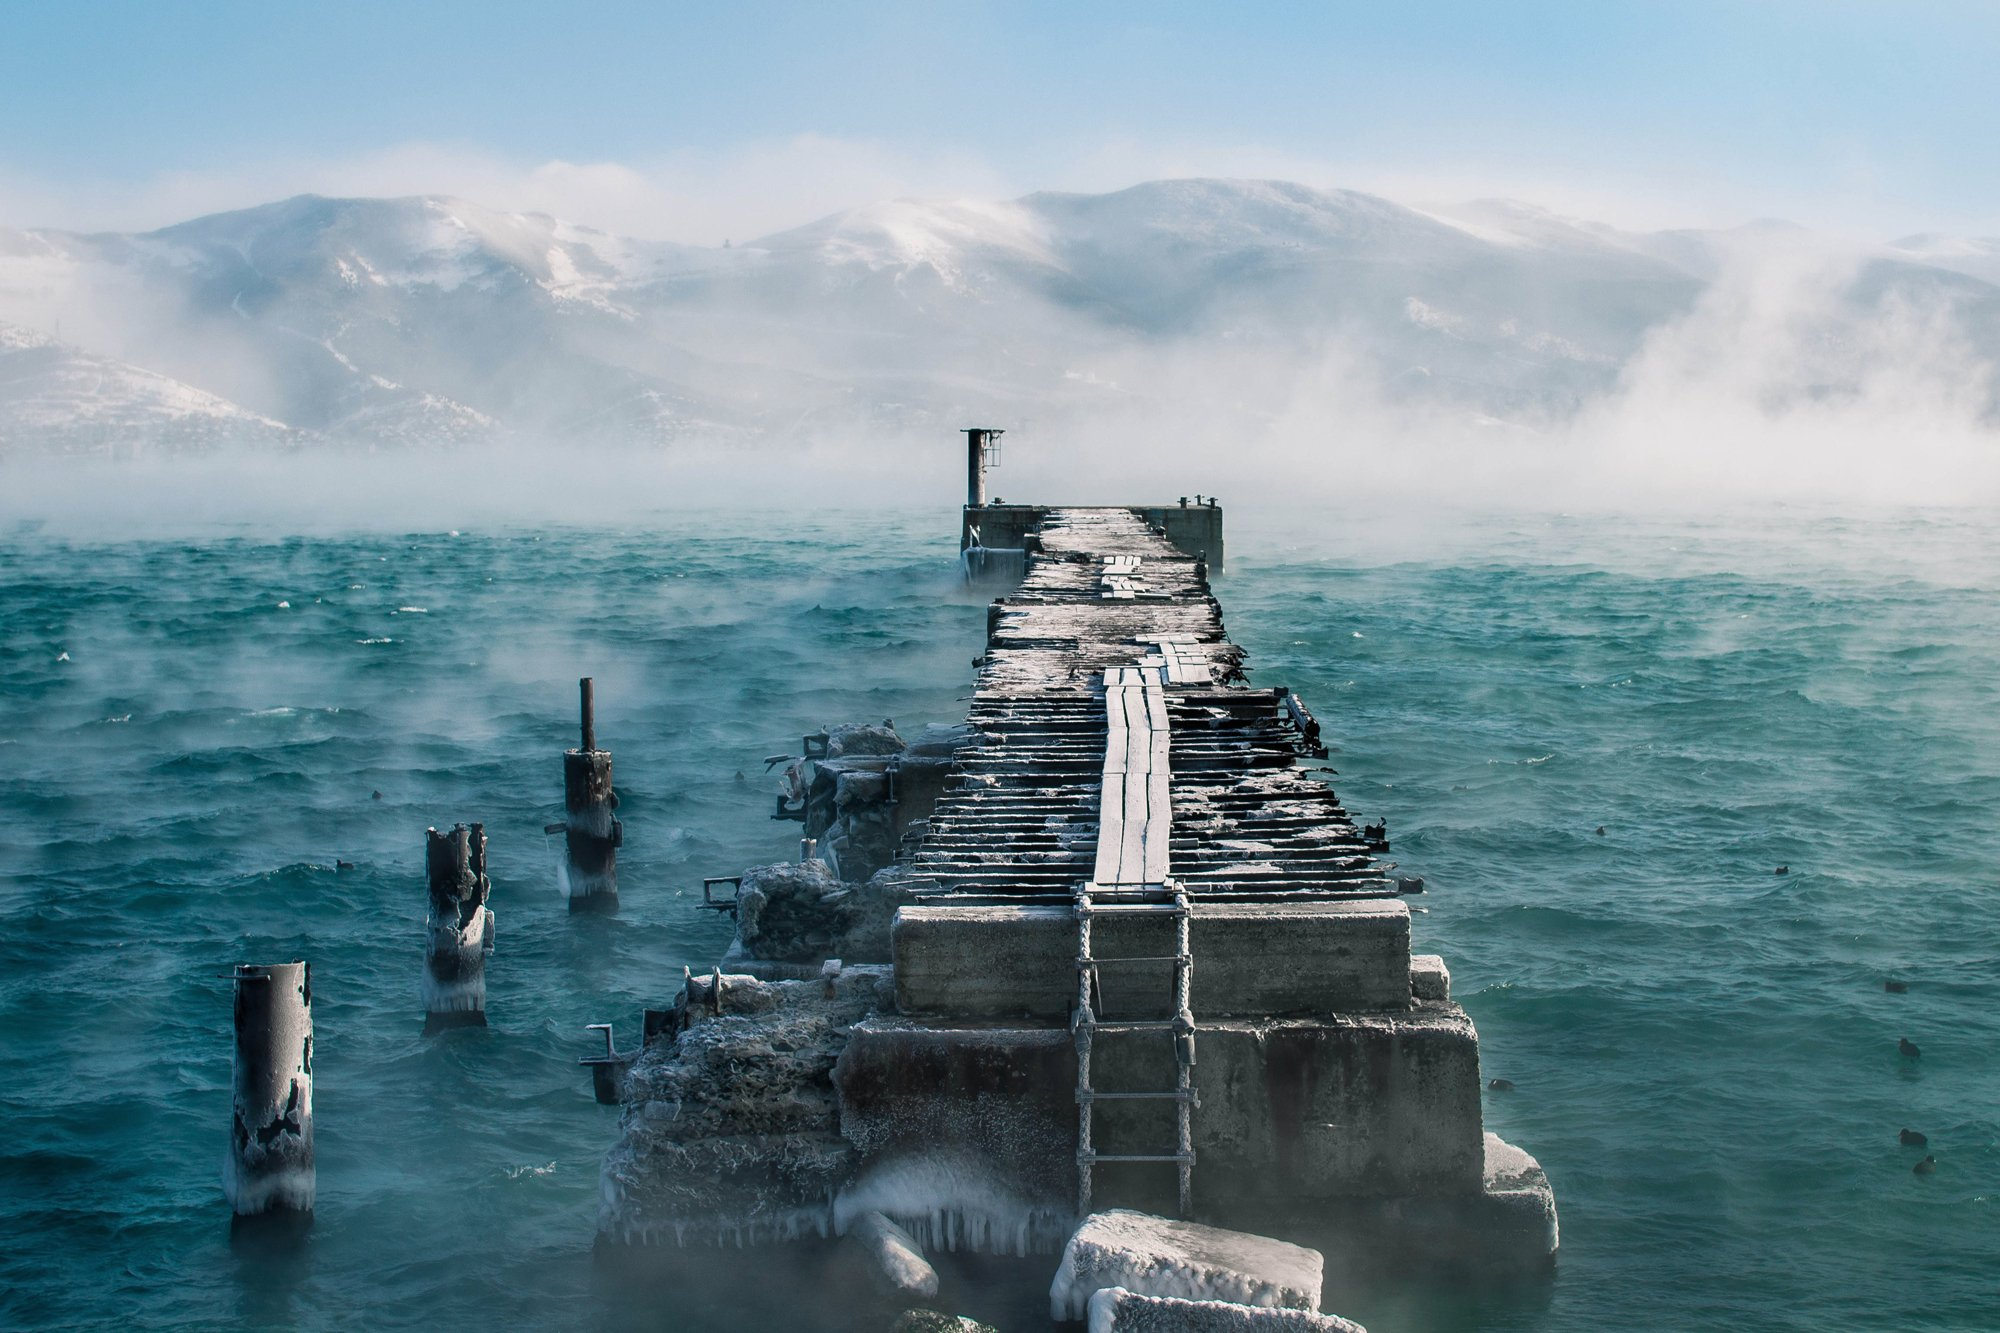 море, мороз, пирс, Скубский Алексей